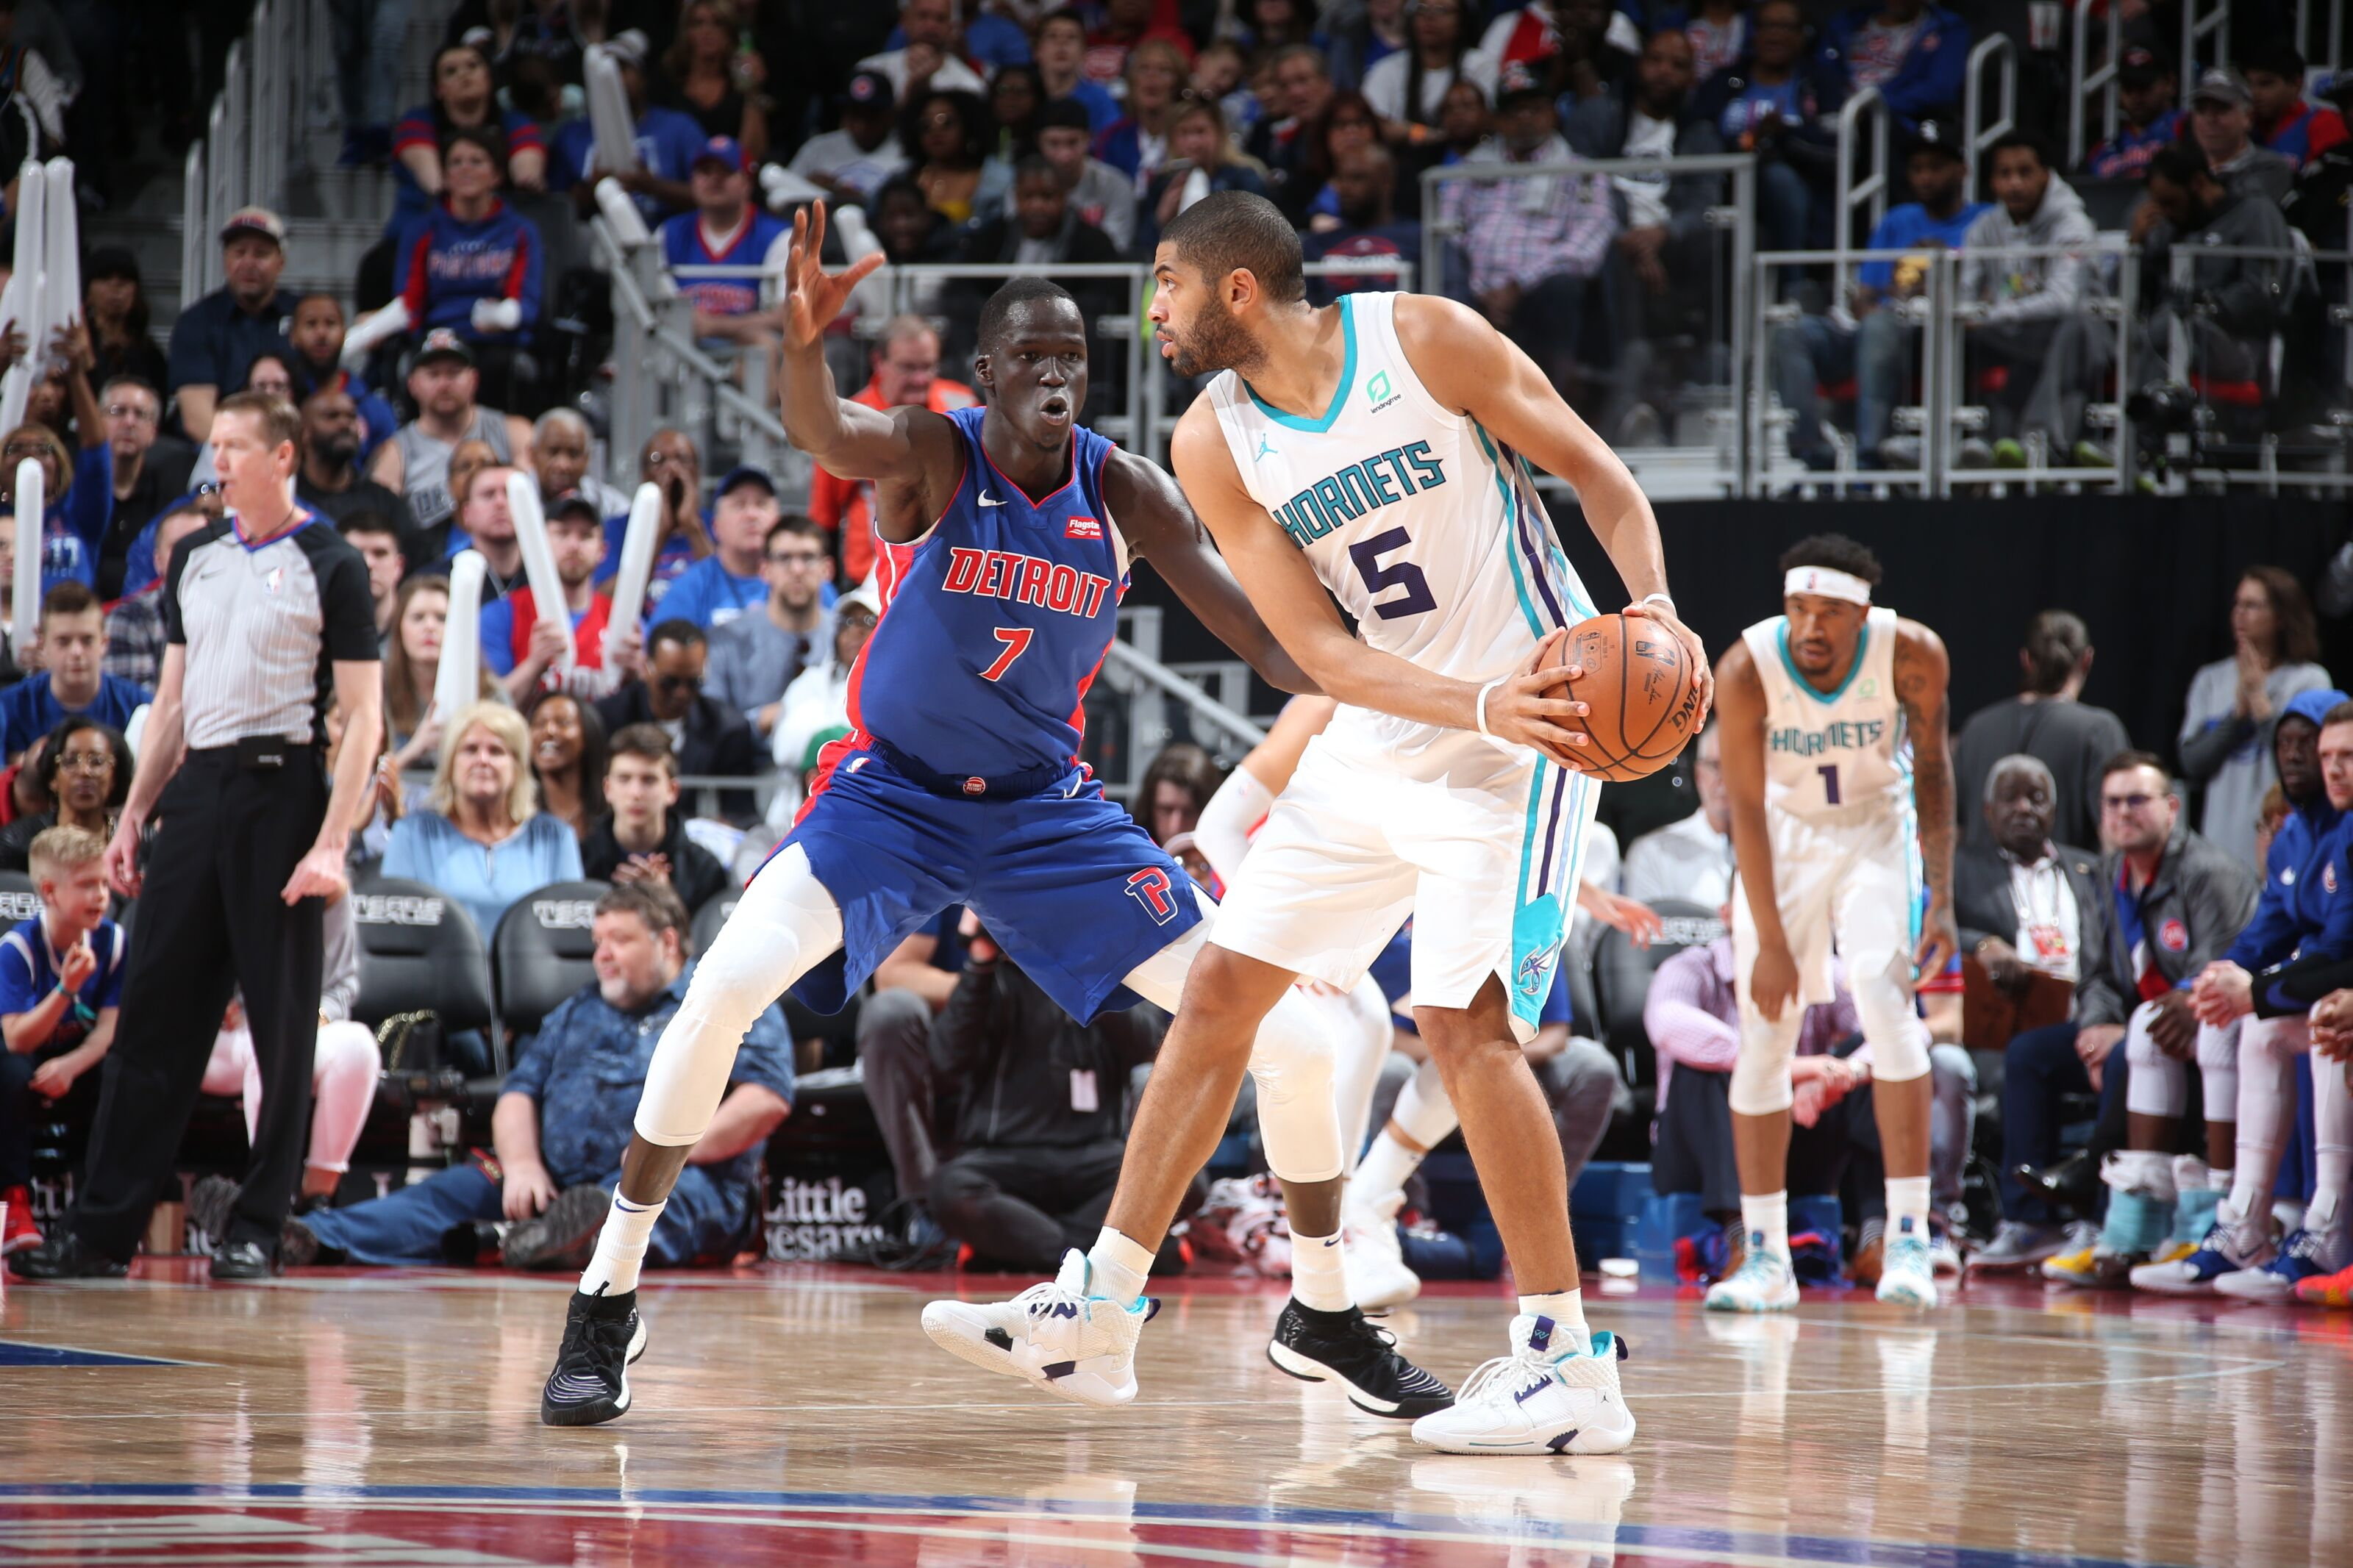 Charlotte Hornets take on the Detroit Pistons to close 2019-20 preseason